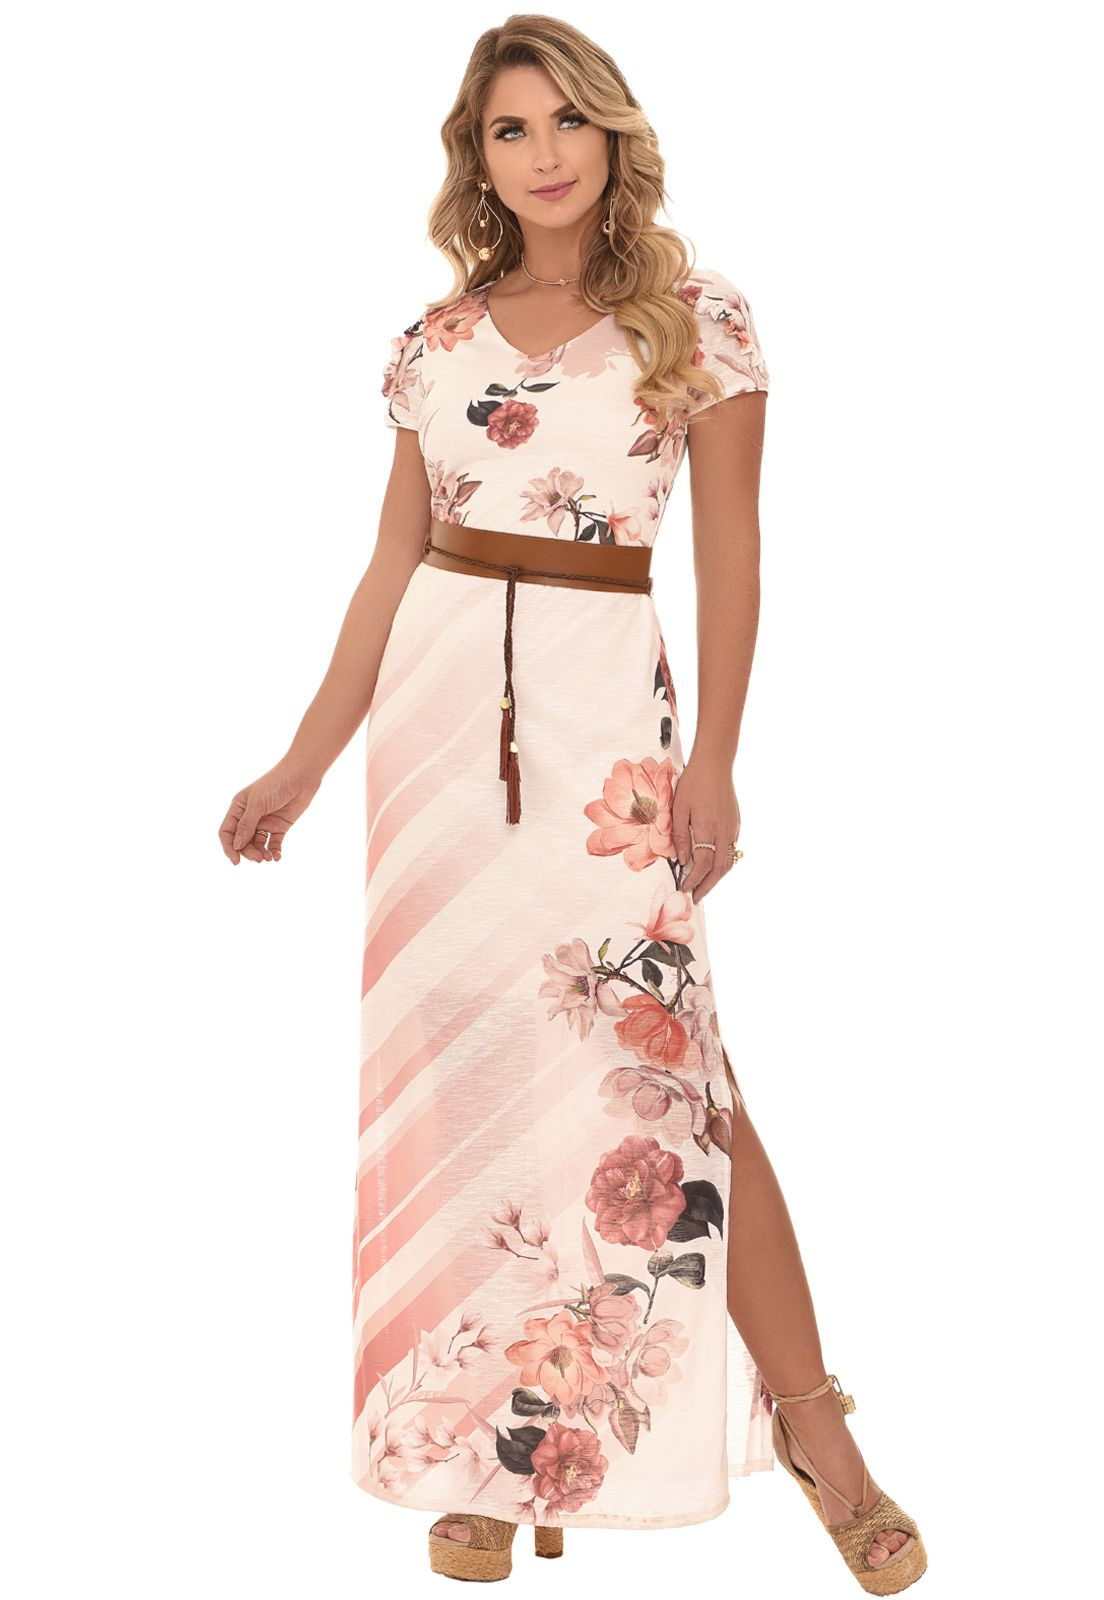 Vestido Fasciniu s Beth Estampa Floral Rosa Moda Evangélica ... 07845d08bbe